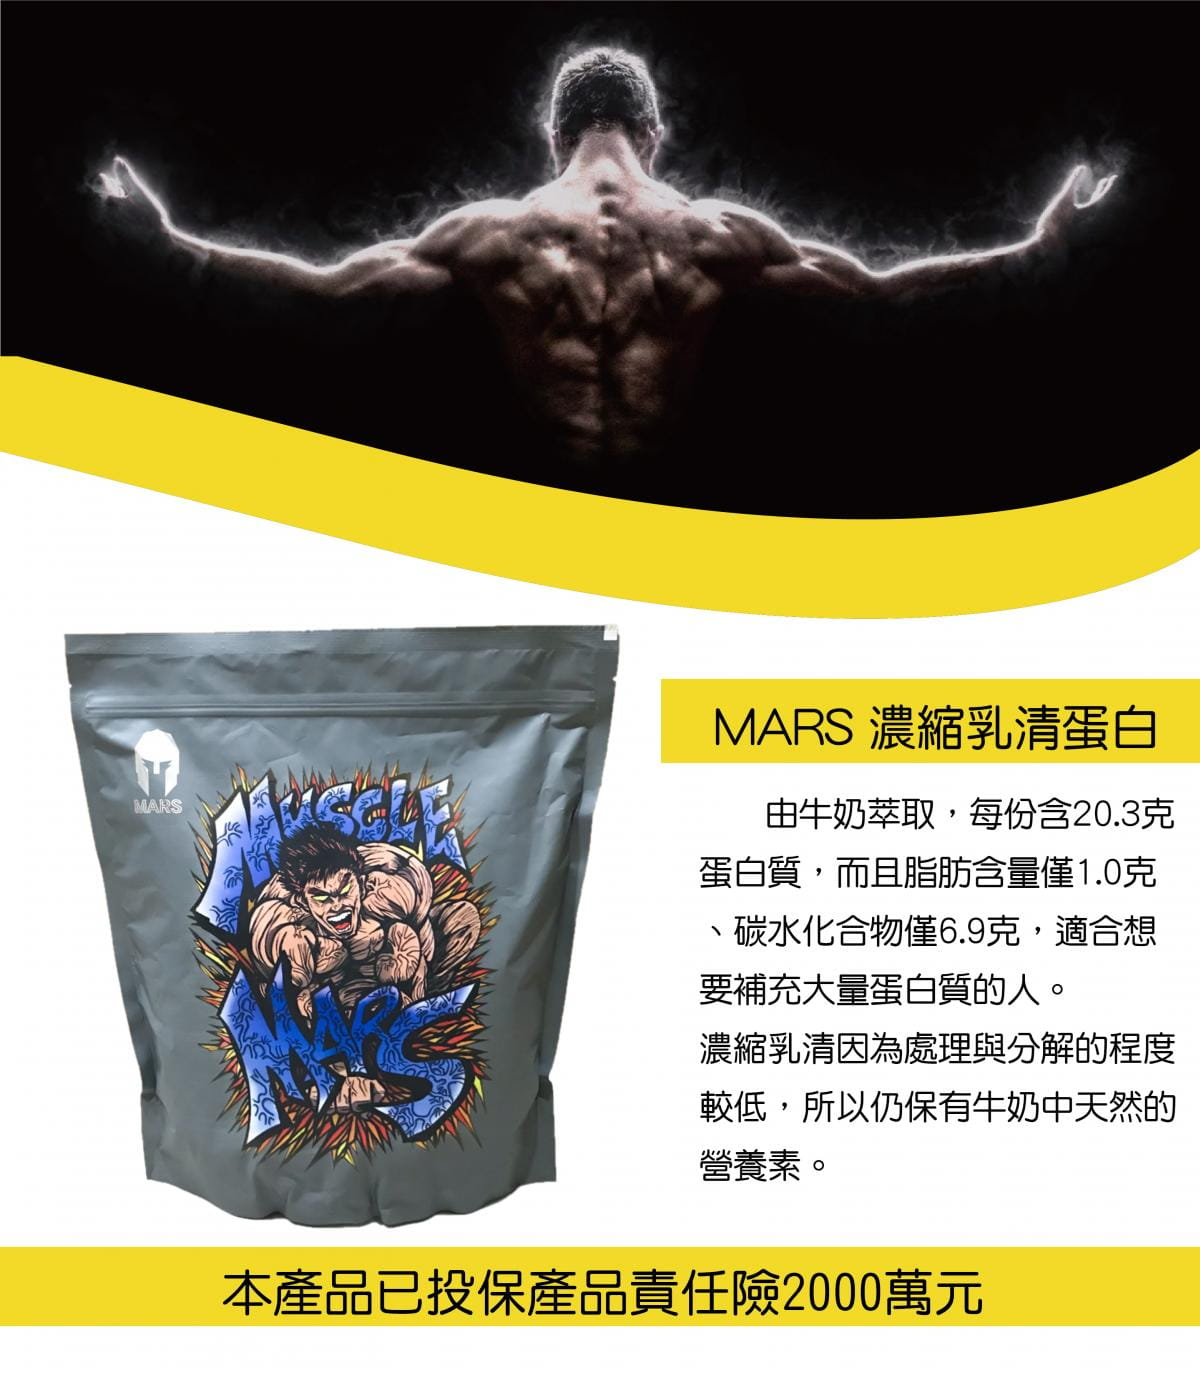 【Mars戰神】戰神MARS MUSCLE 濃縮乳清 調味系列 2